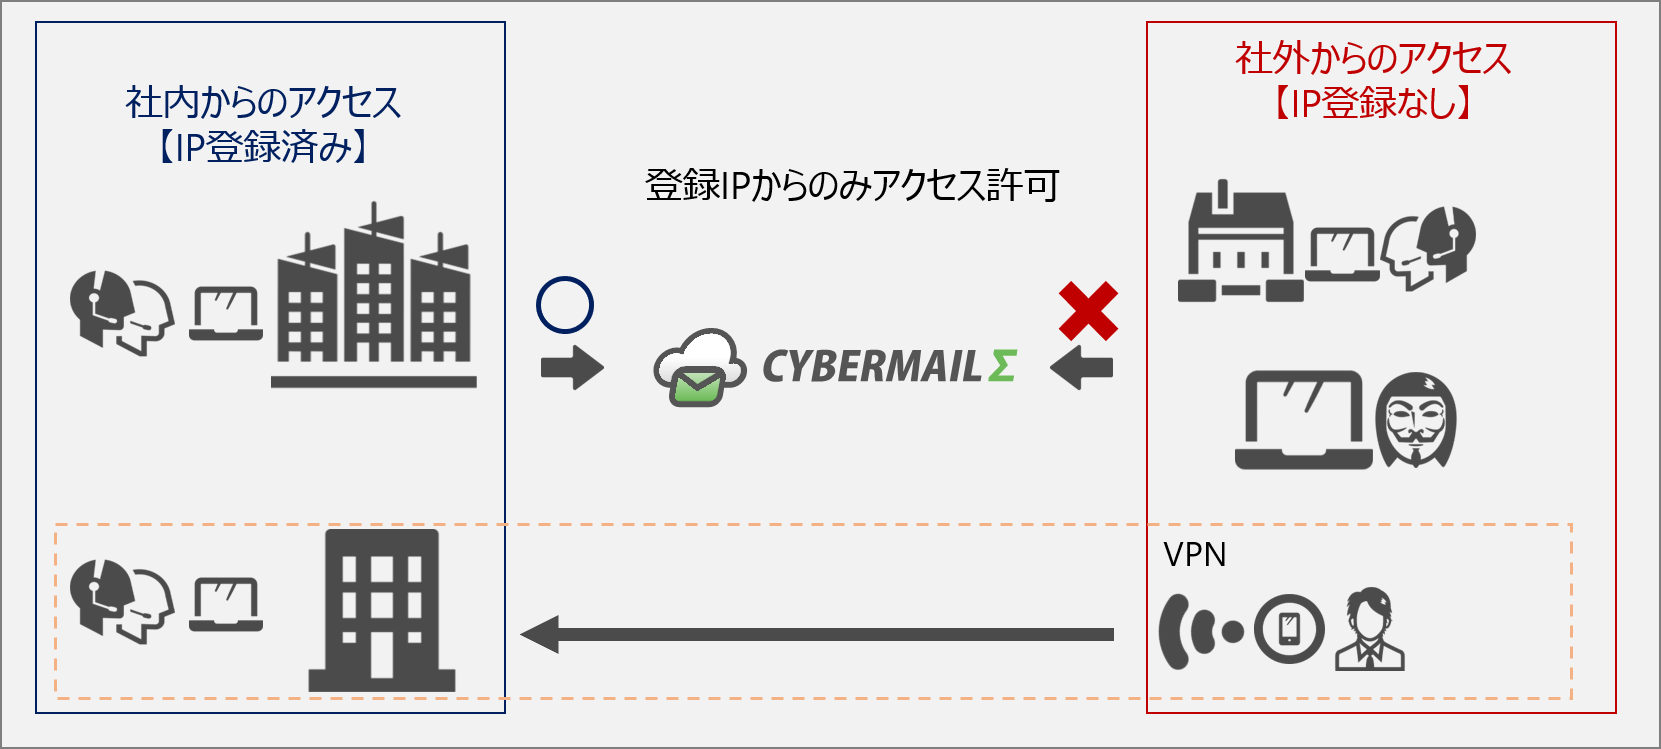 IPアクセス制御オプションイメージ図